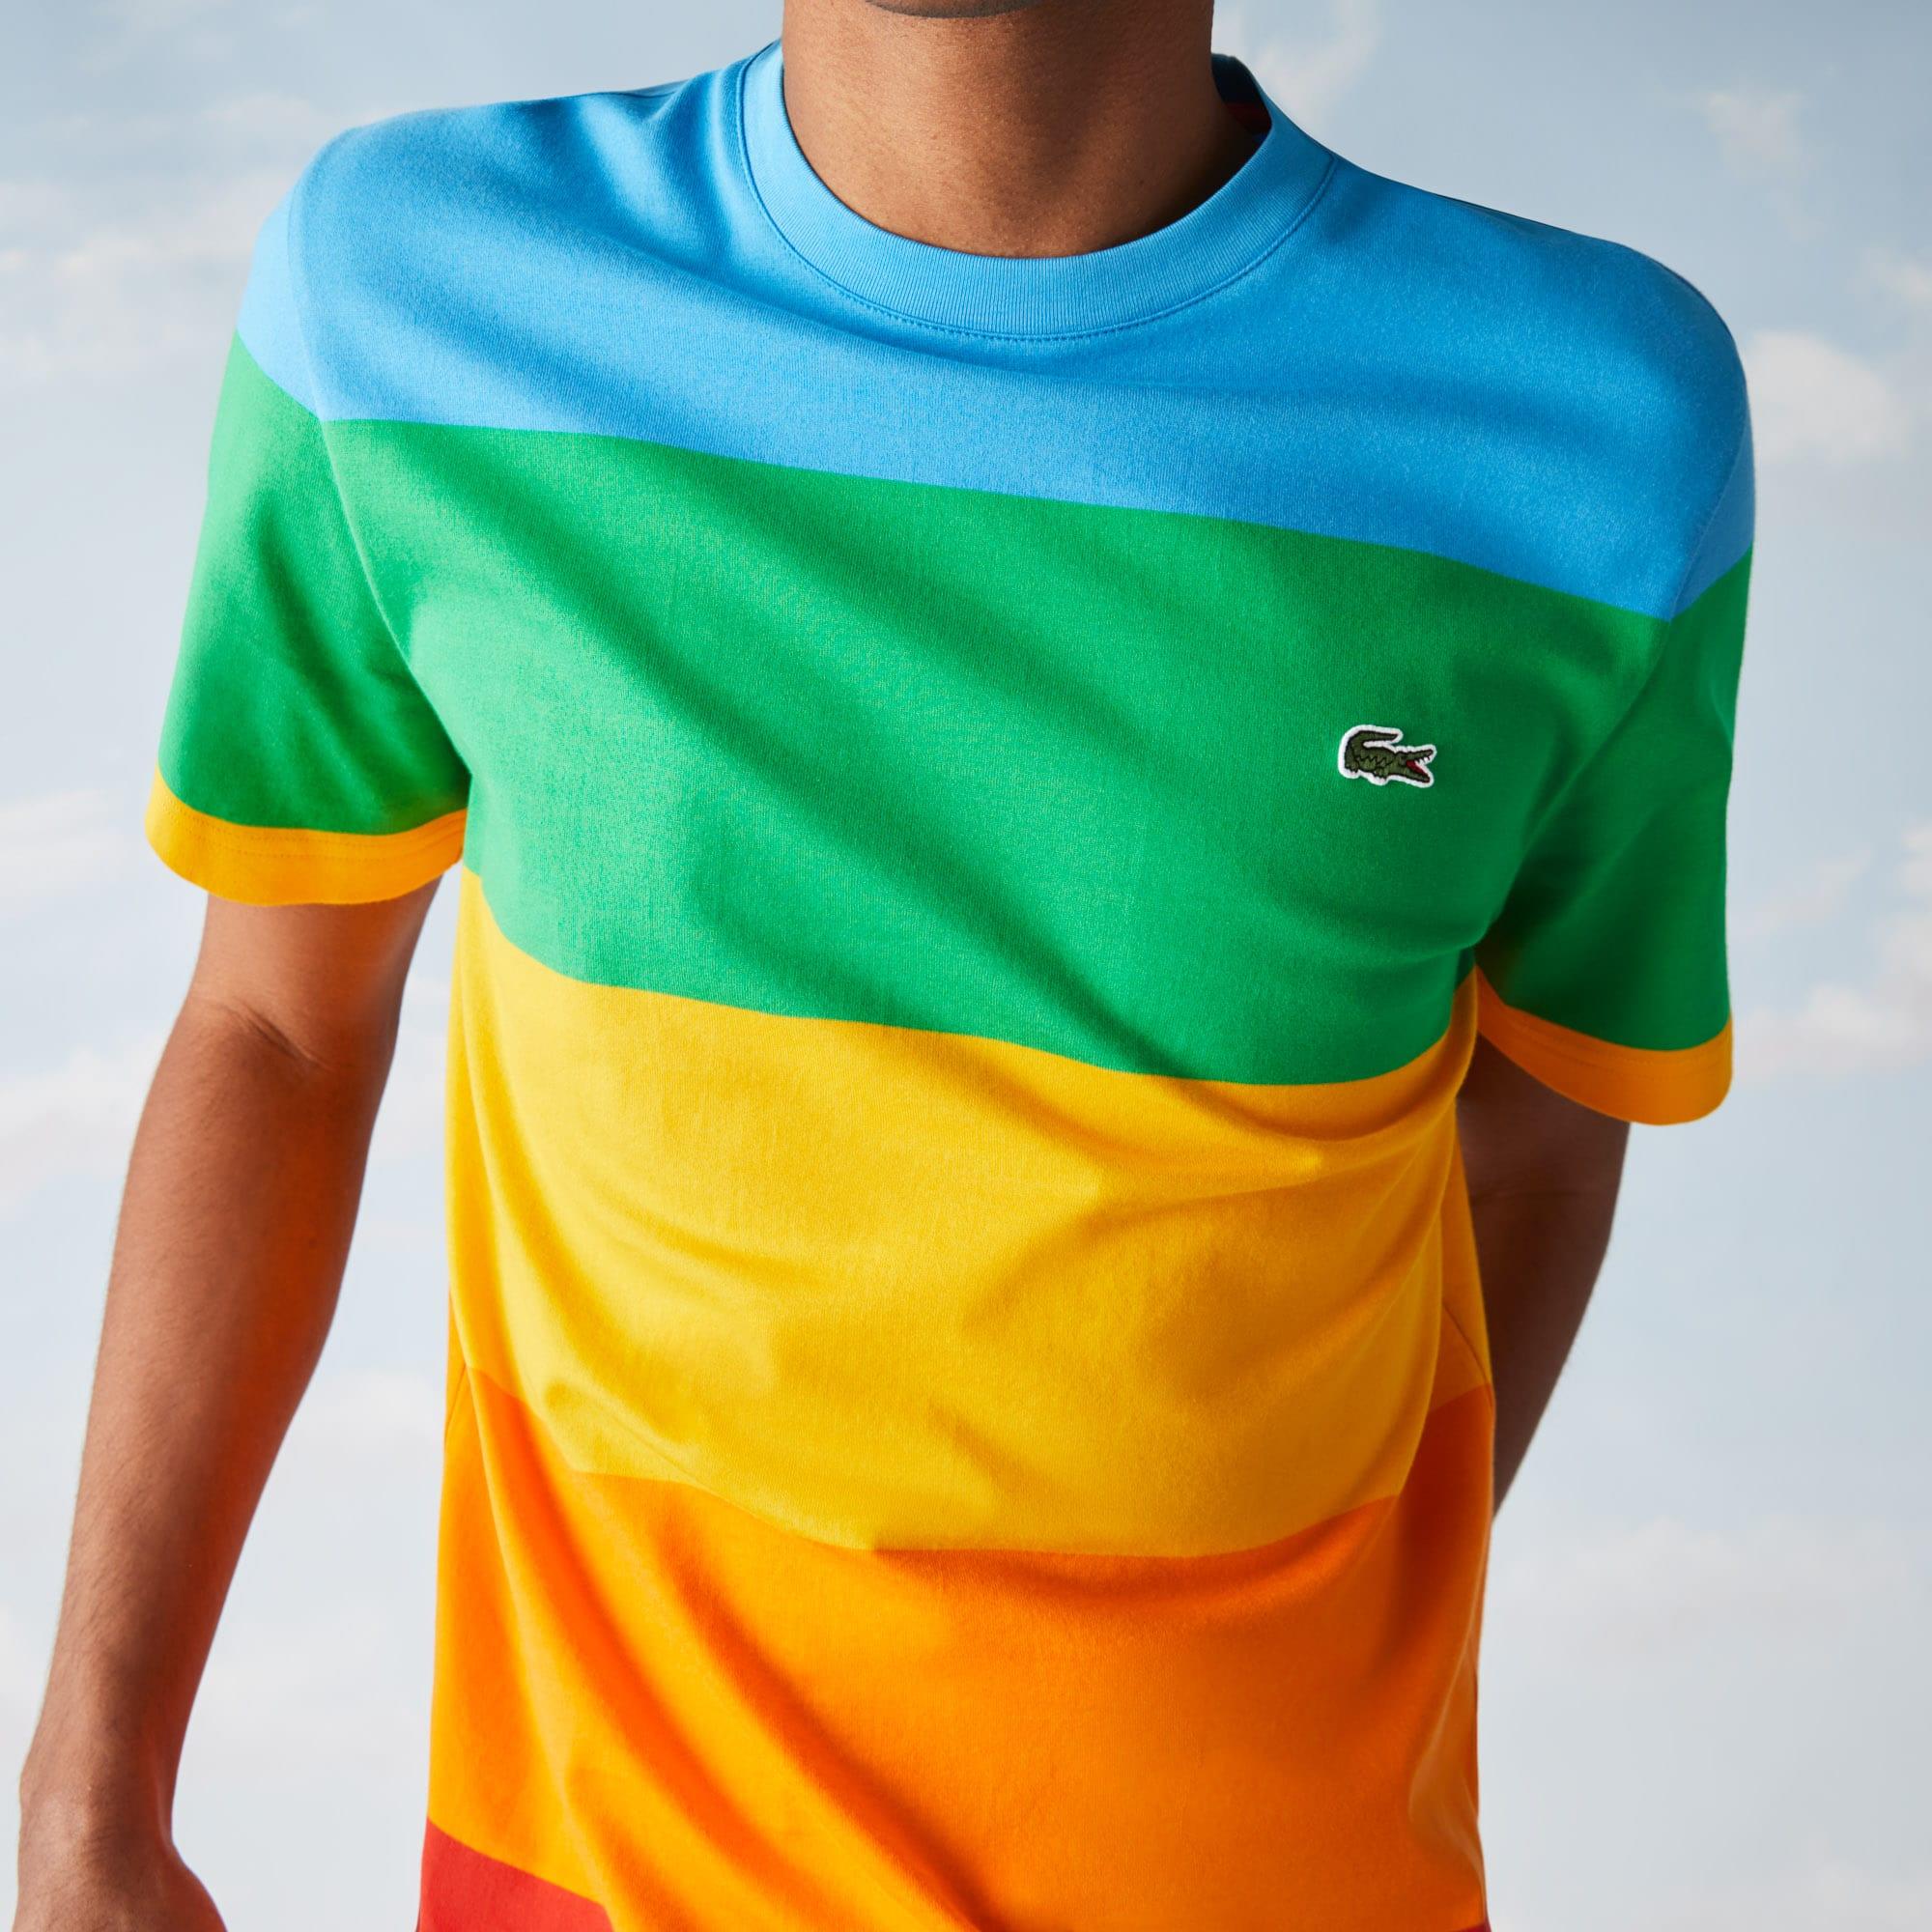 Men's Polaroid Collaboration Crew Neck Color Striped T-shirt